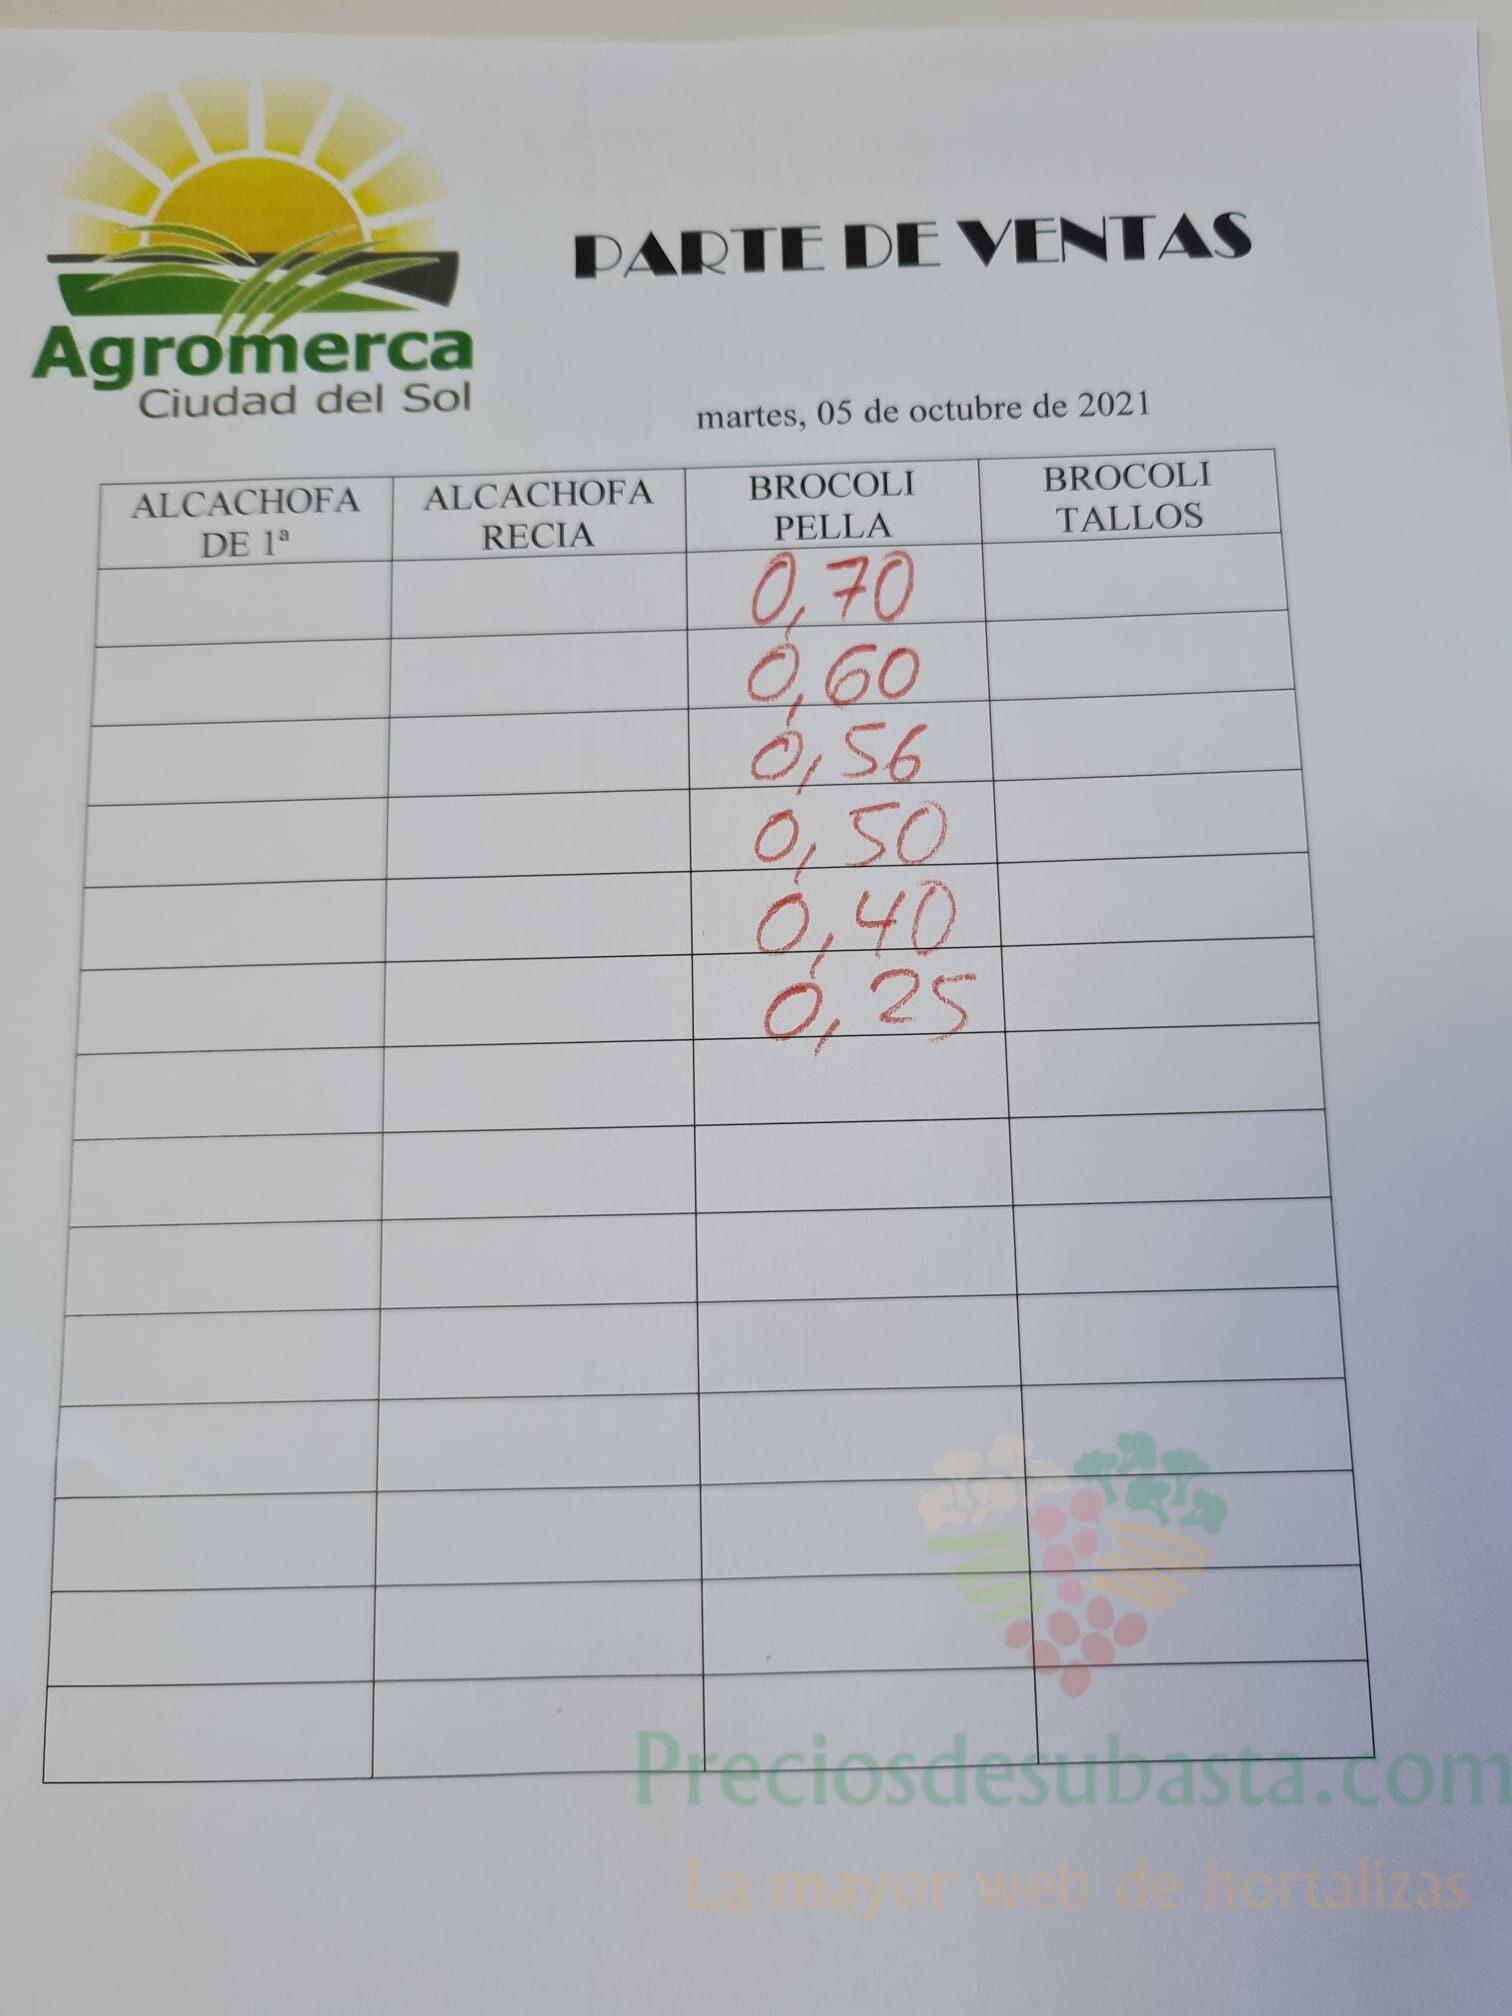 Subasta hortofrutícola Agromerca 5 de octubre 2021